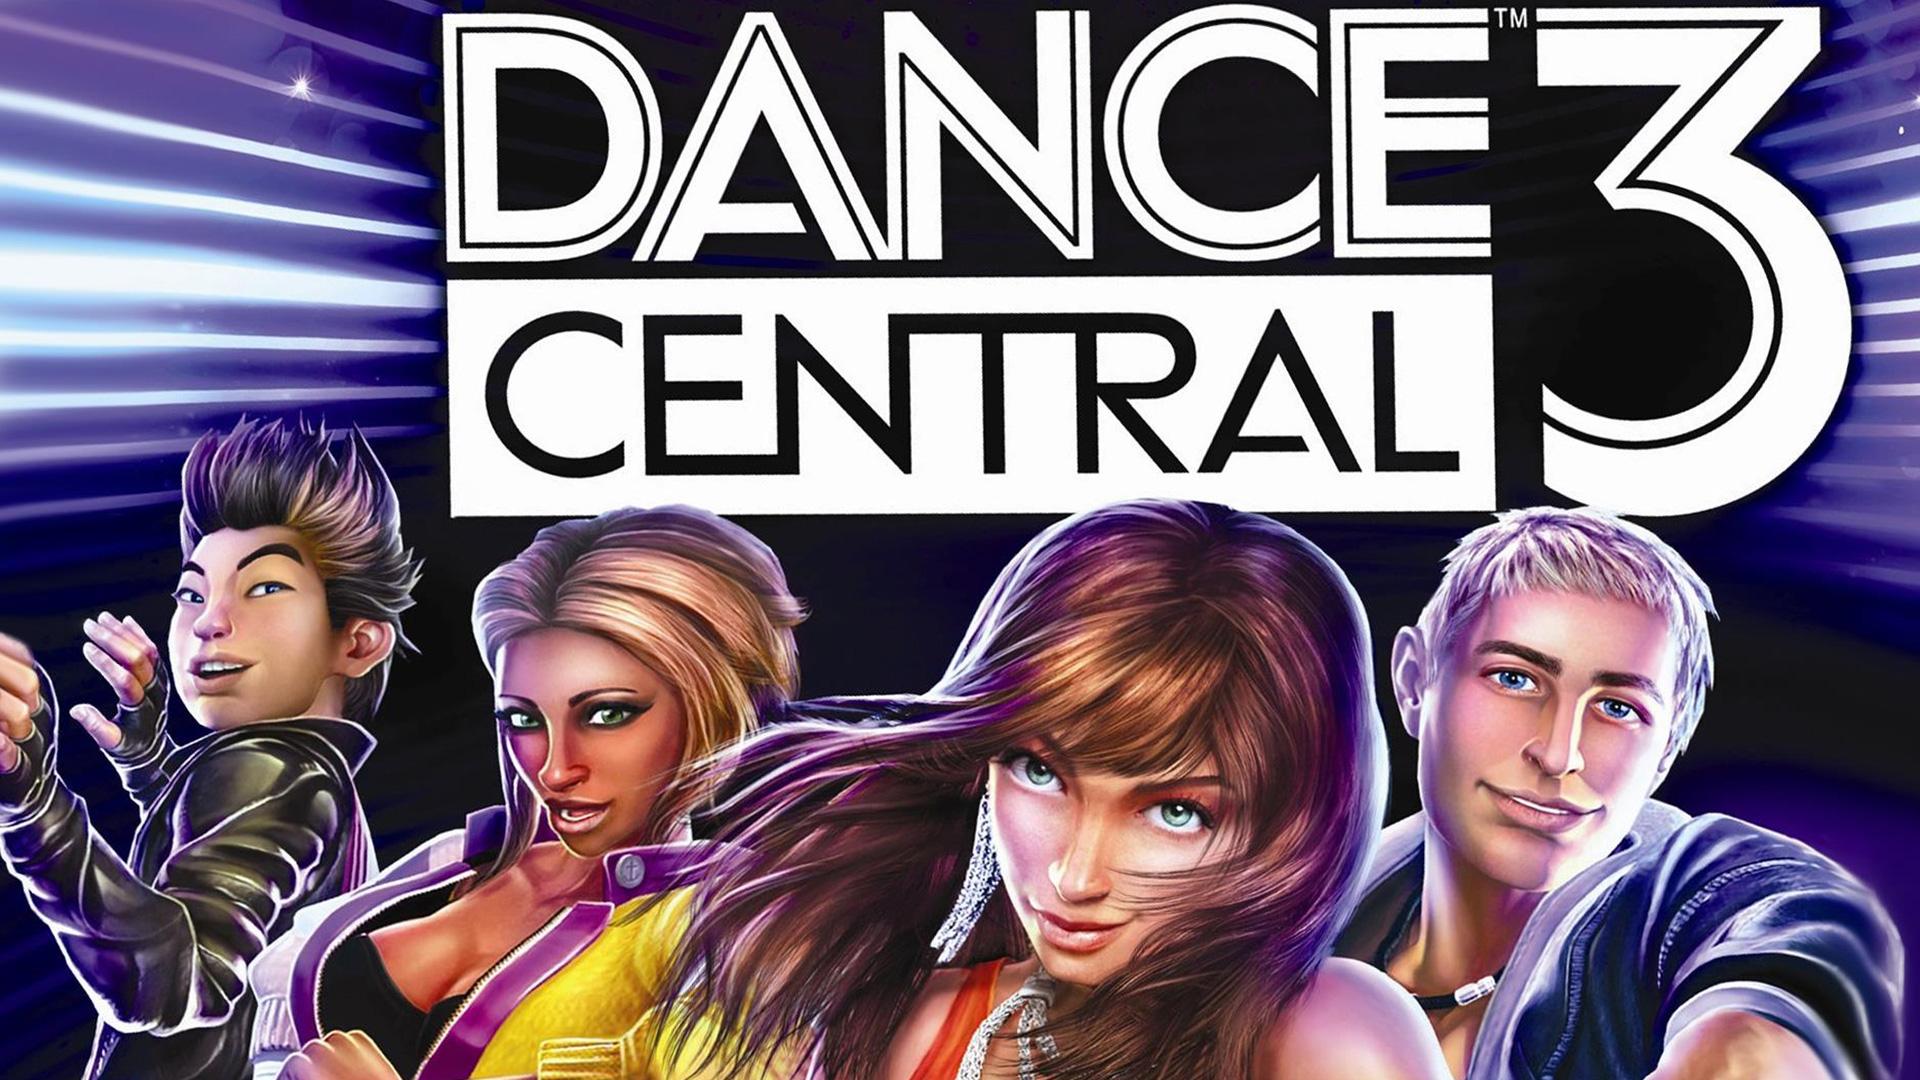 Dance Central 3 Wallpaper in 1920x1080